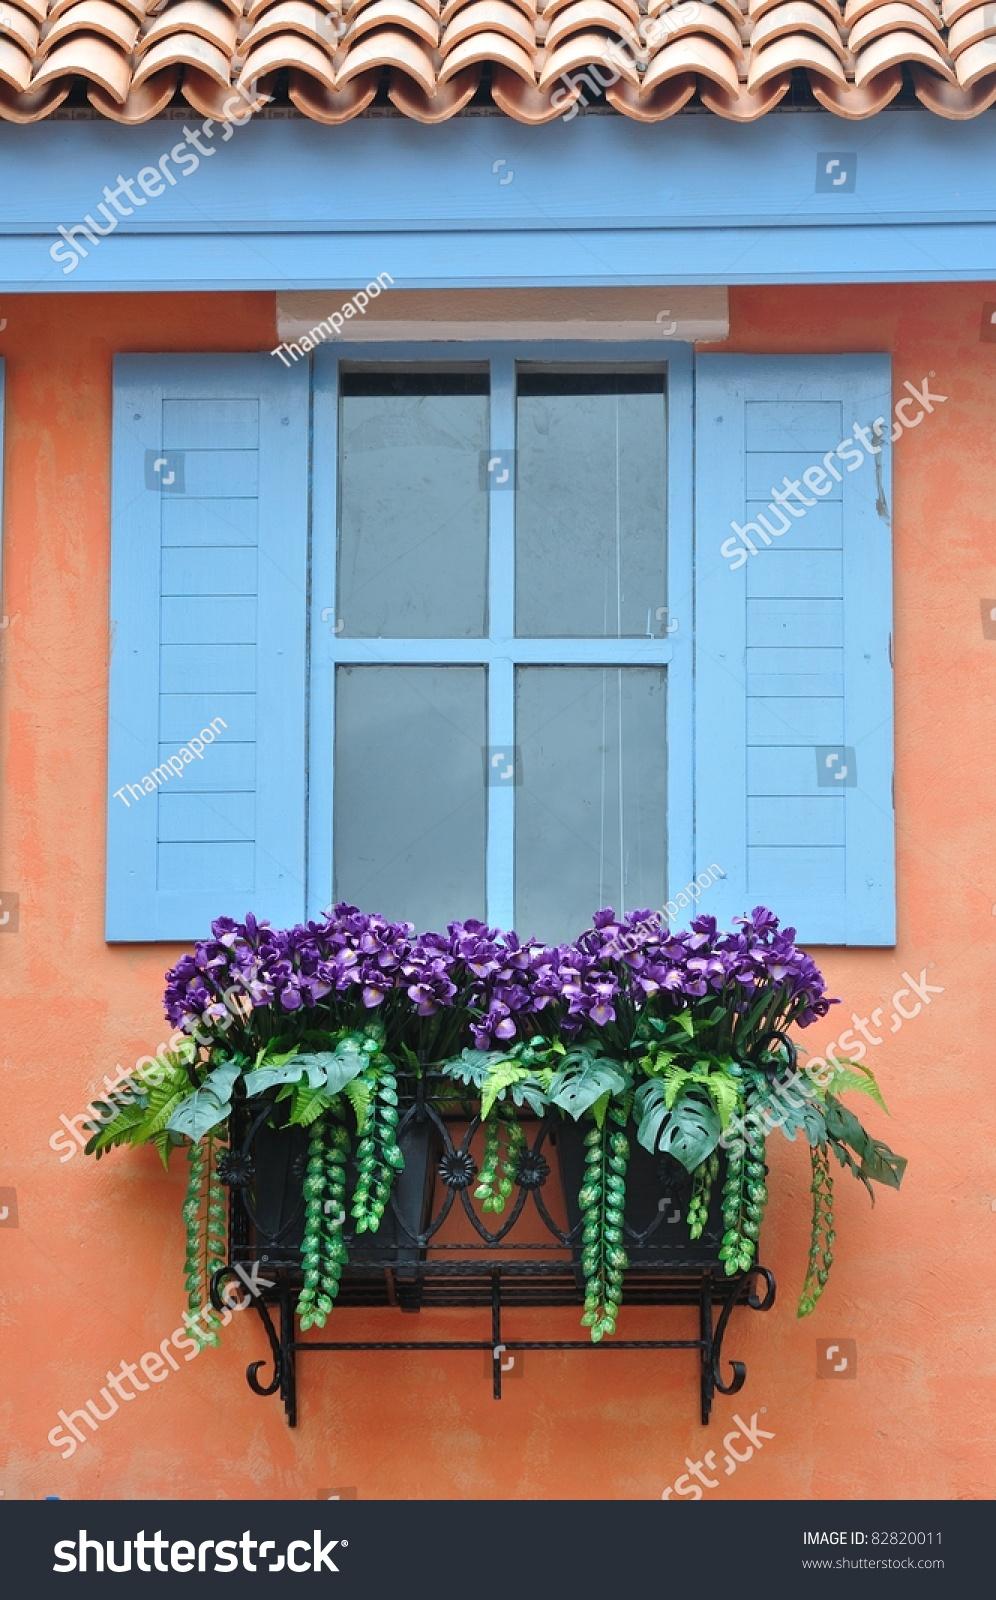 European style window stock photo 82820011 shutterstock for European style windows